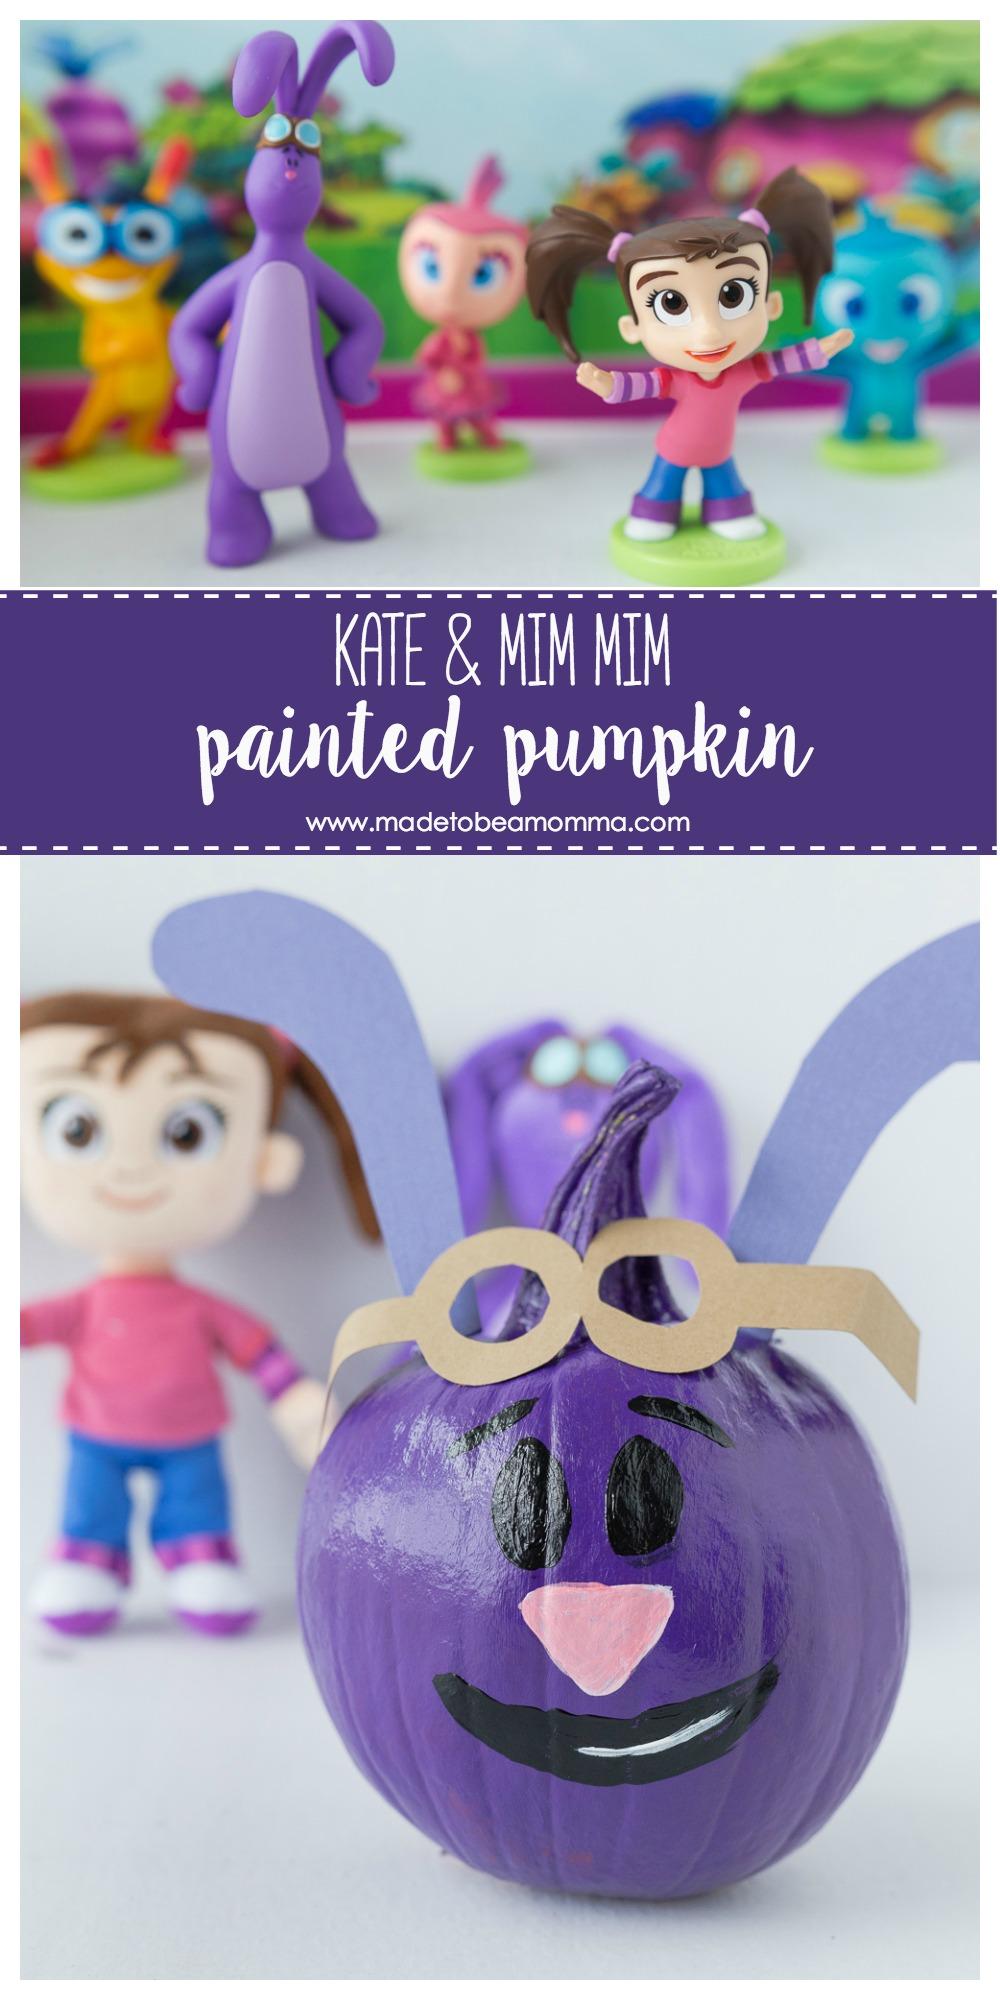 Kate & Mim Mim Pumpkin: a fun painted Mim Mim pumpkin the kids can enjoy! www.madetobeamomma.com